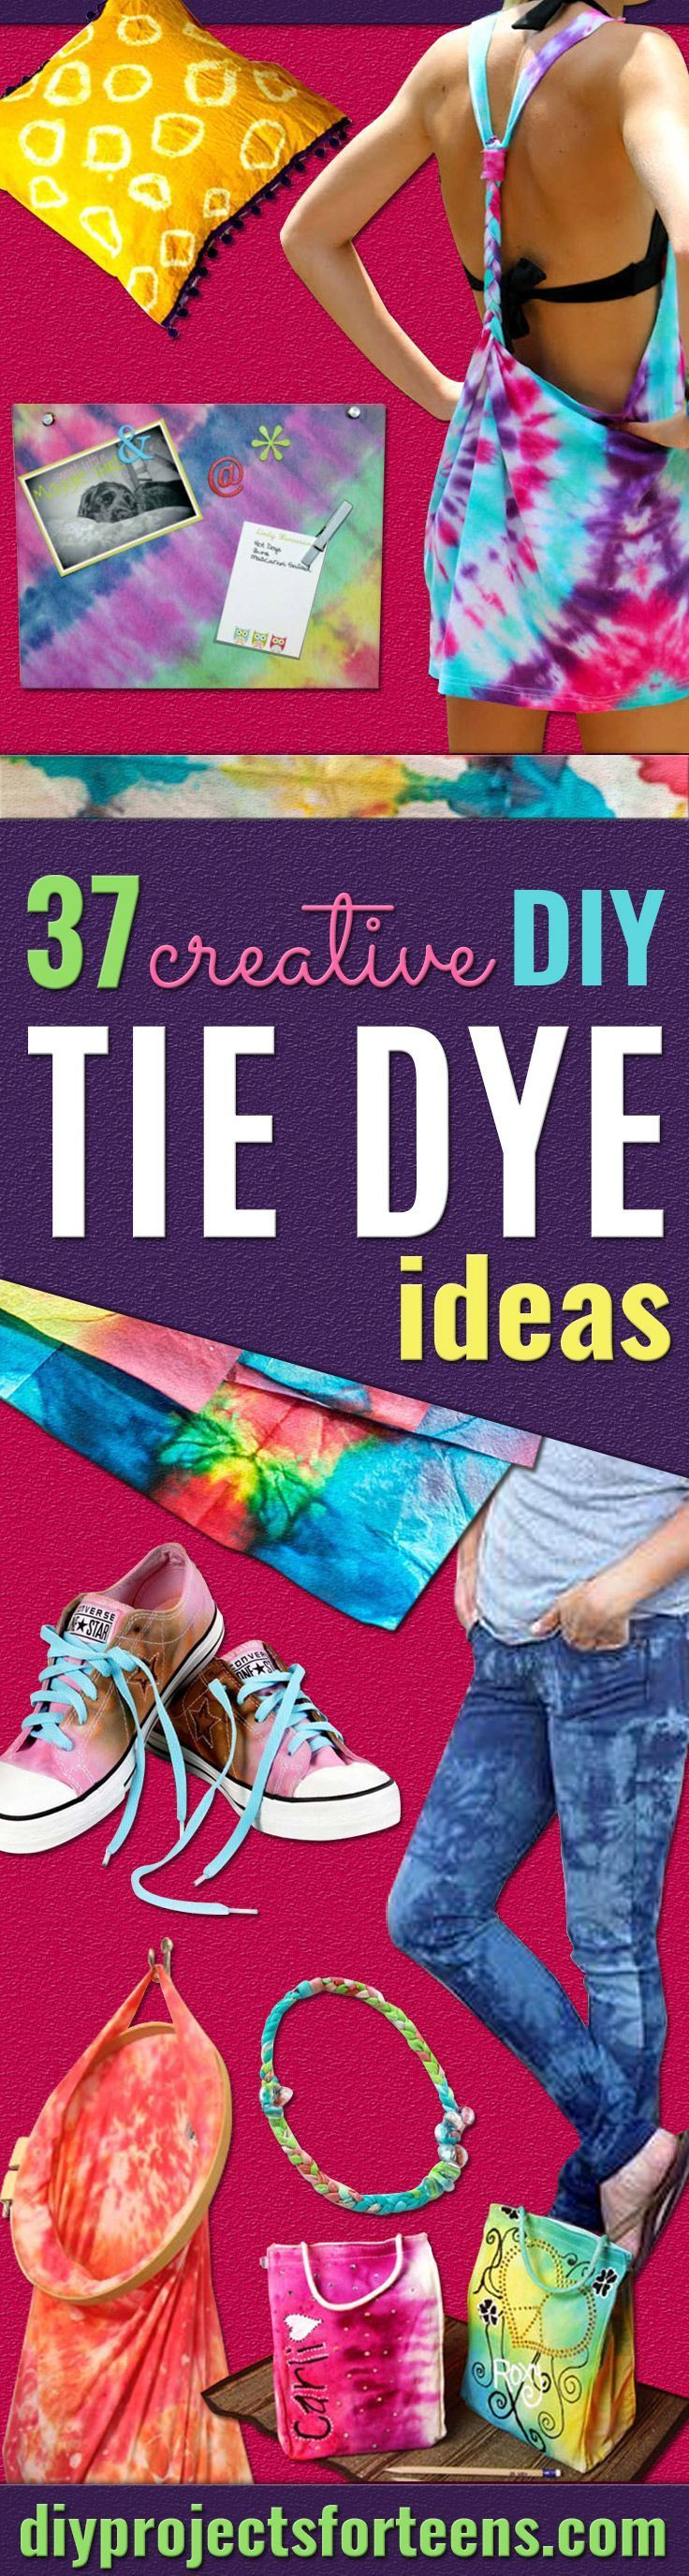 37 Creative DIY Tie Dye Ideas That